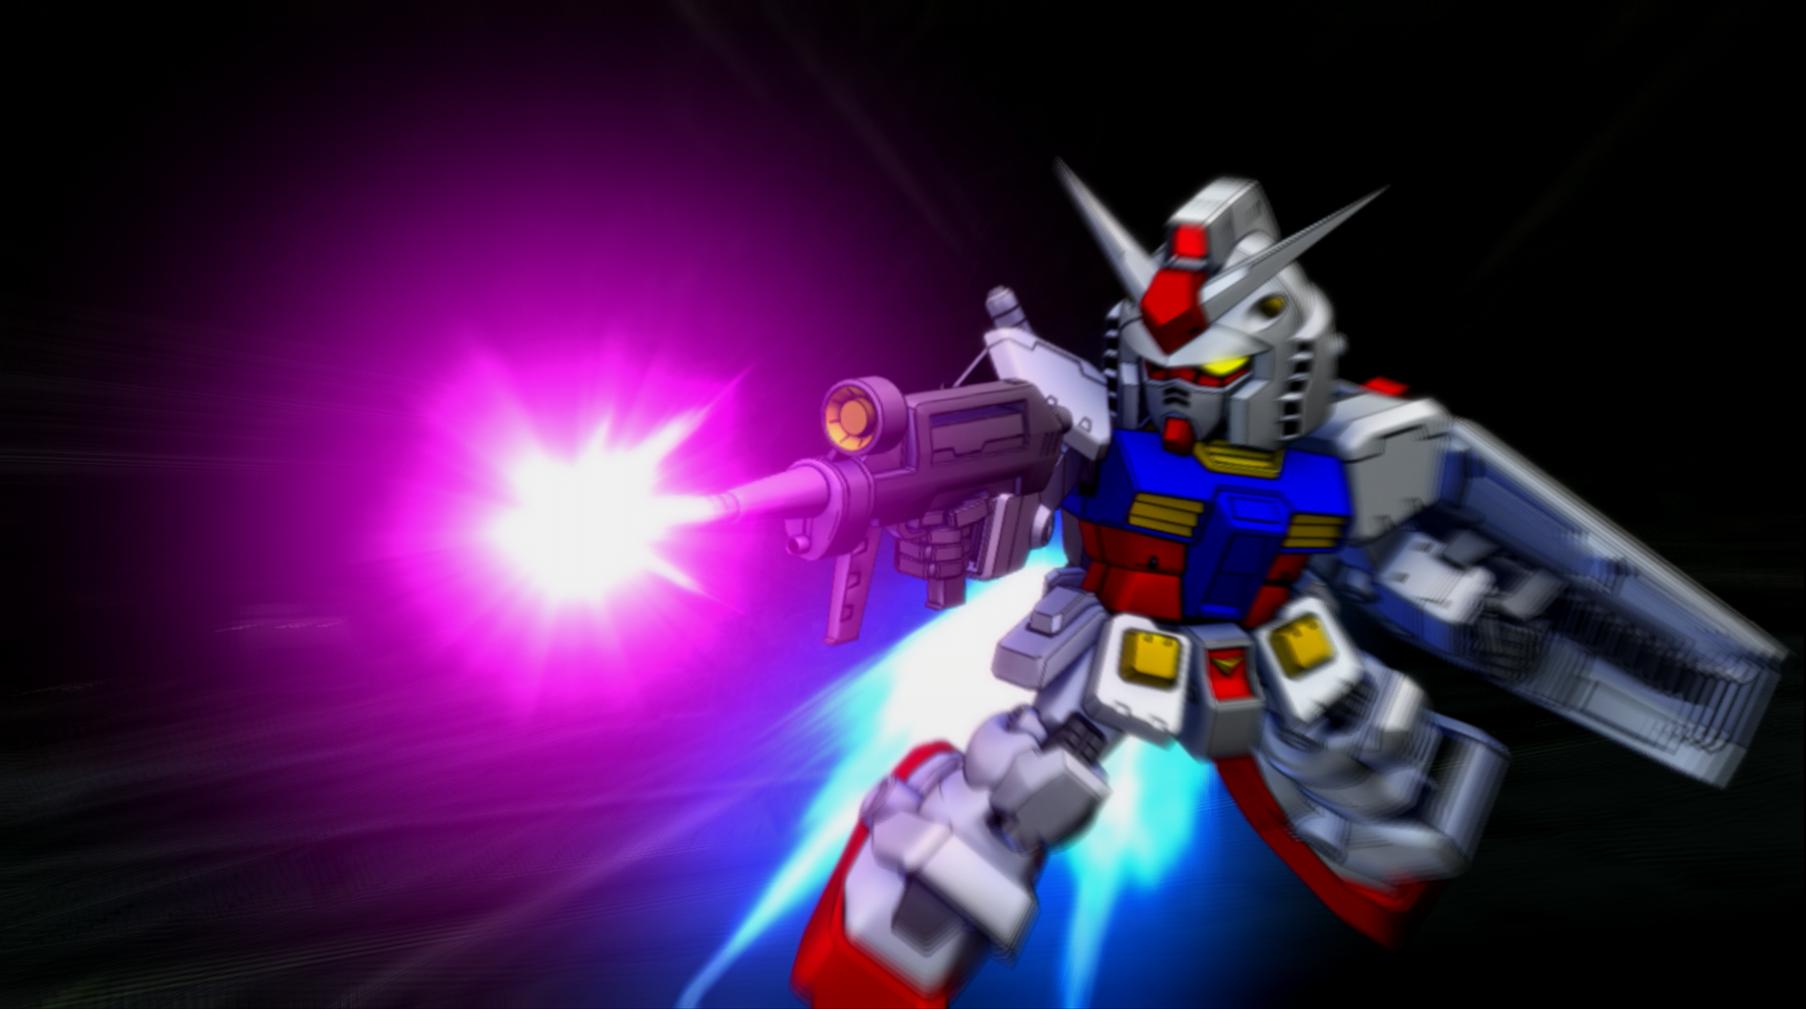 SD-Gundam-G-Generation-Genesis_2016_07-12-16_002